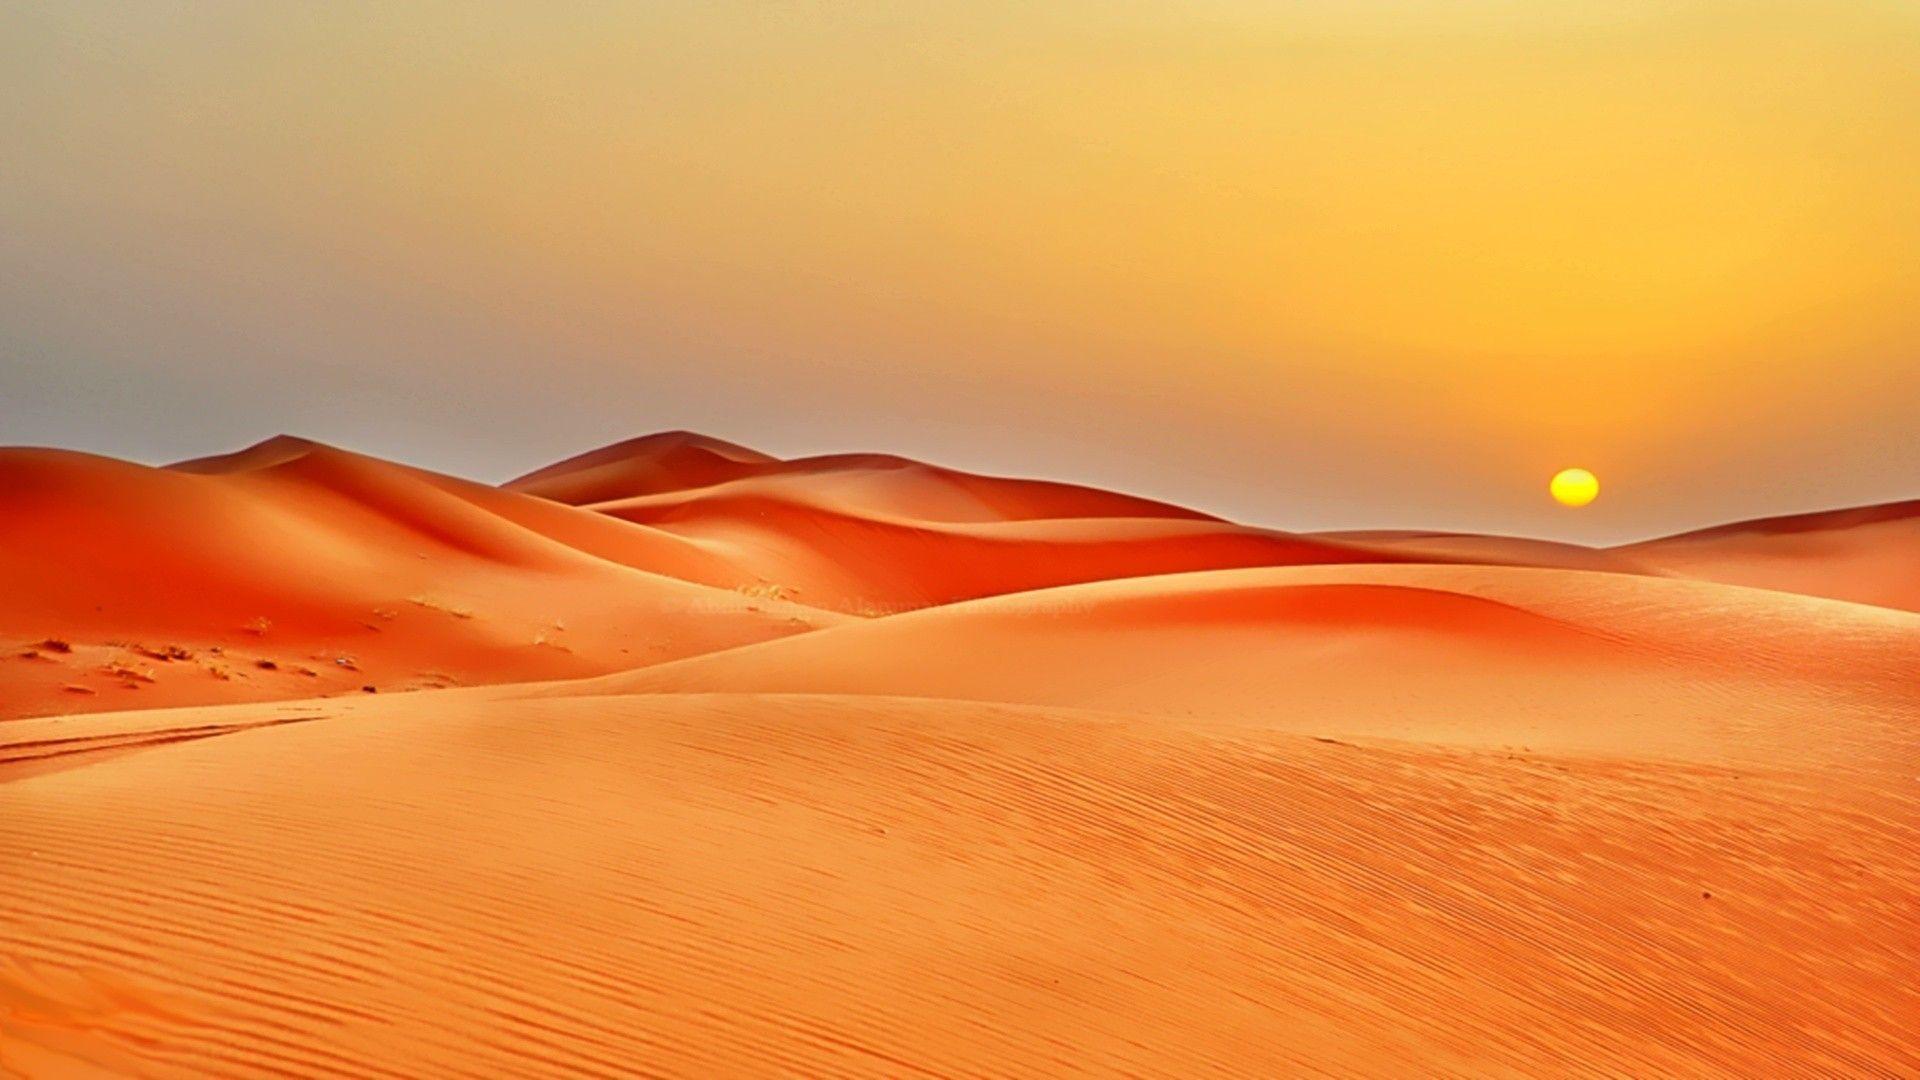 Nature Sun Desert Sand Dunes Wallpaper Nature Wallpaper Dune Art Destop Wallpaper Hd wallpaper sunset desert dunes sand